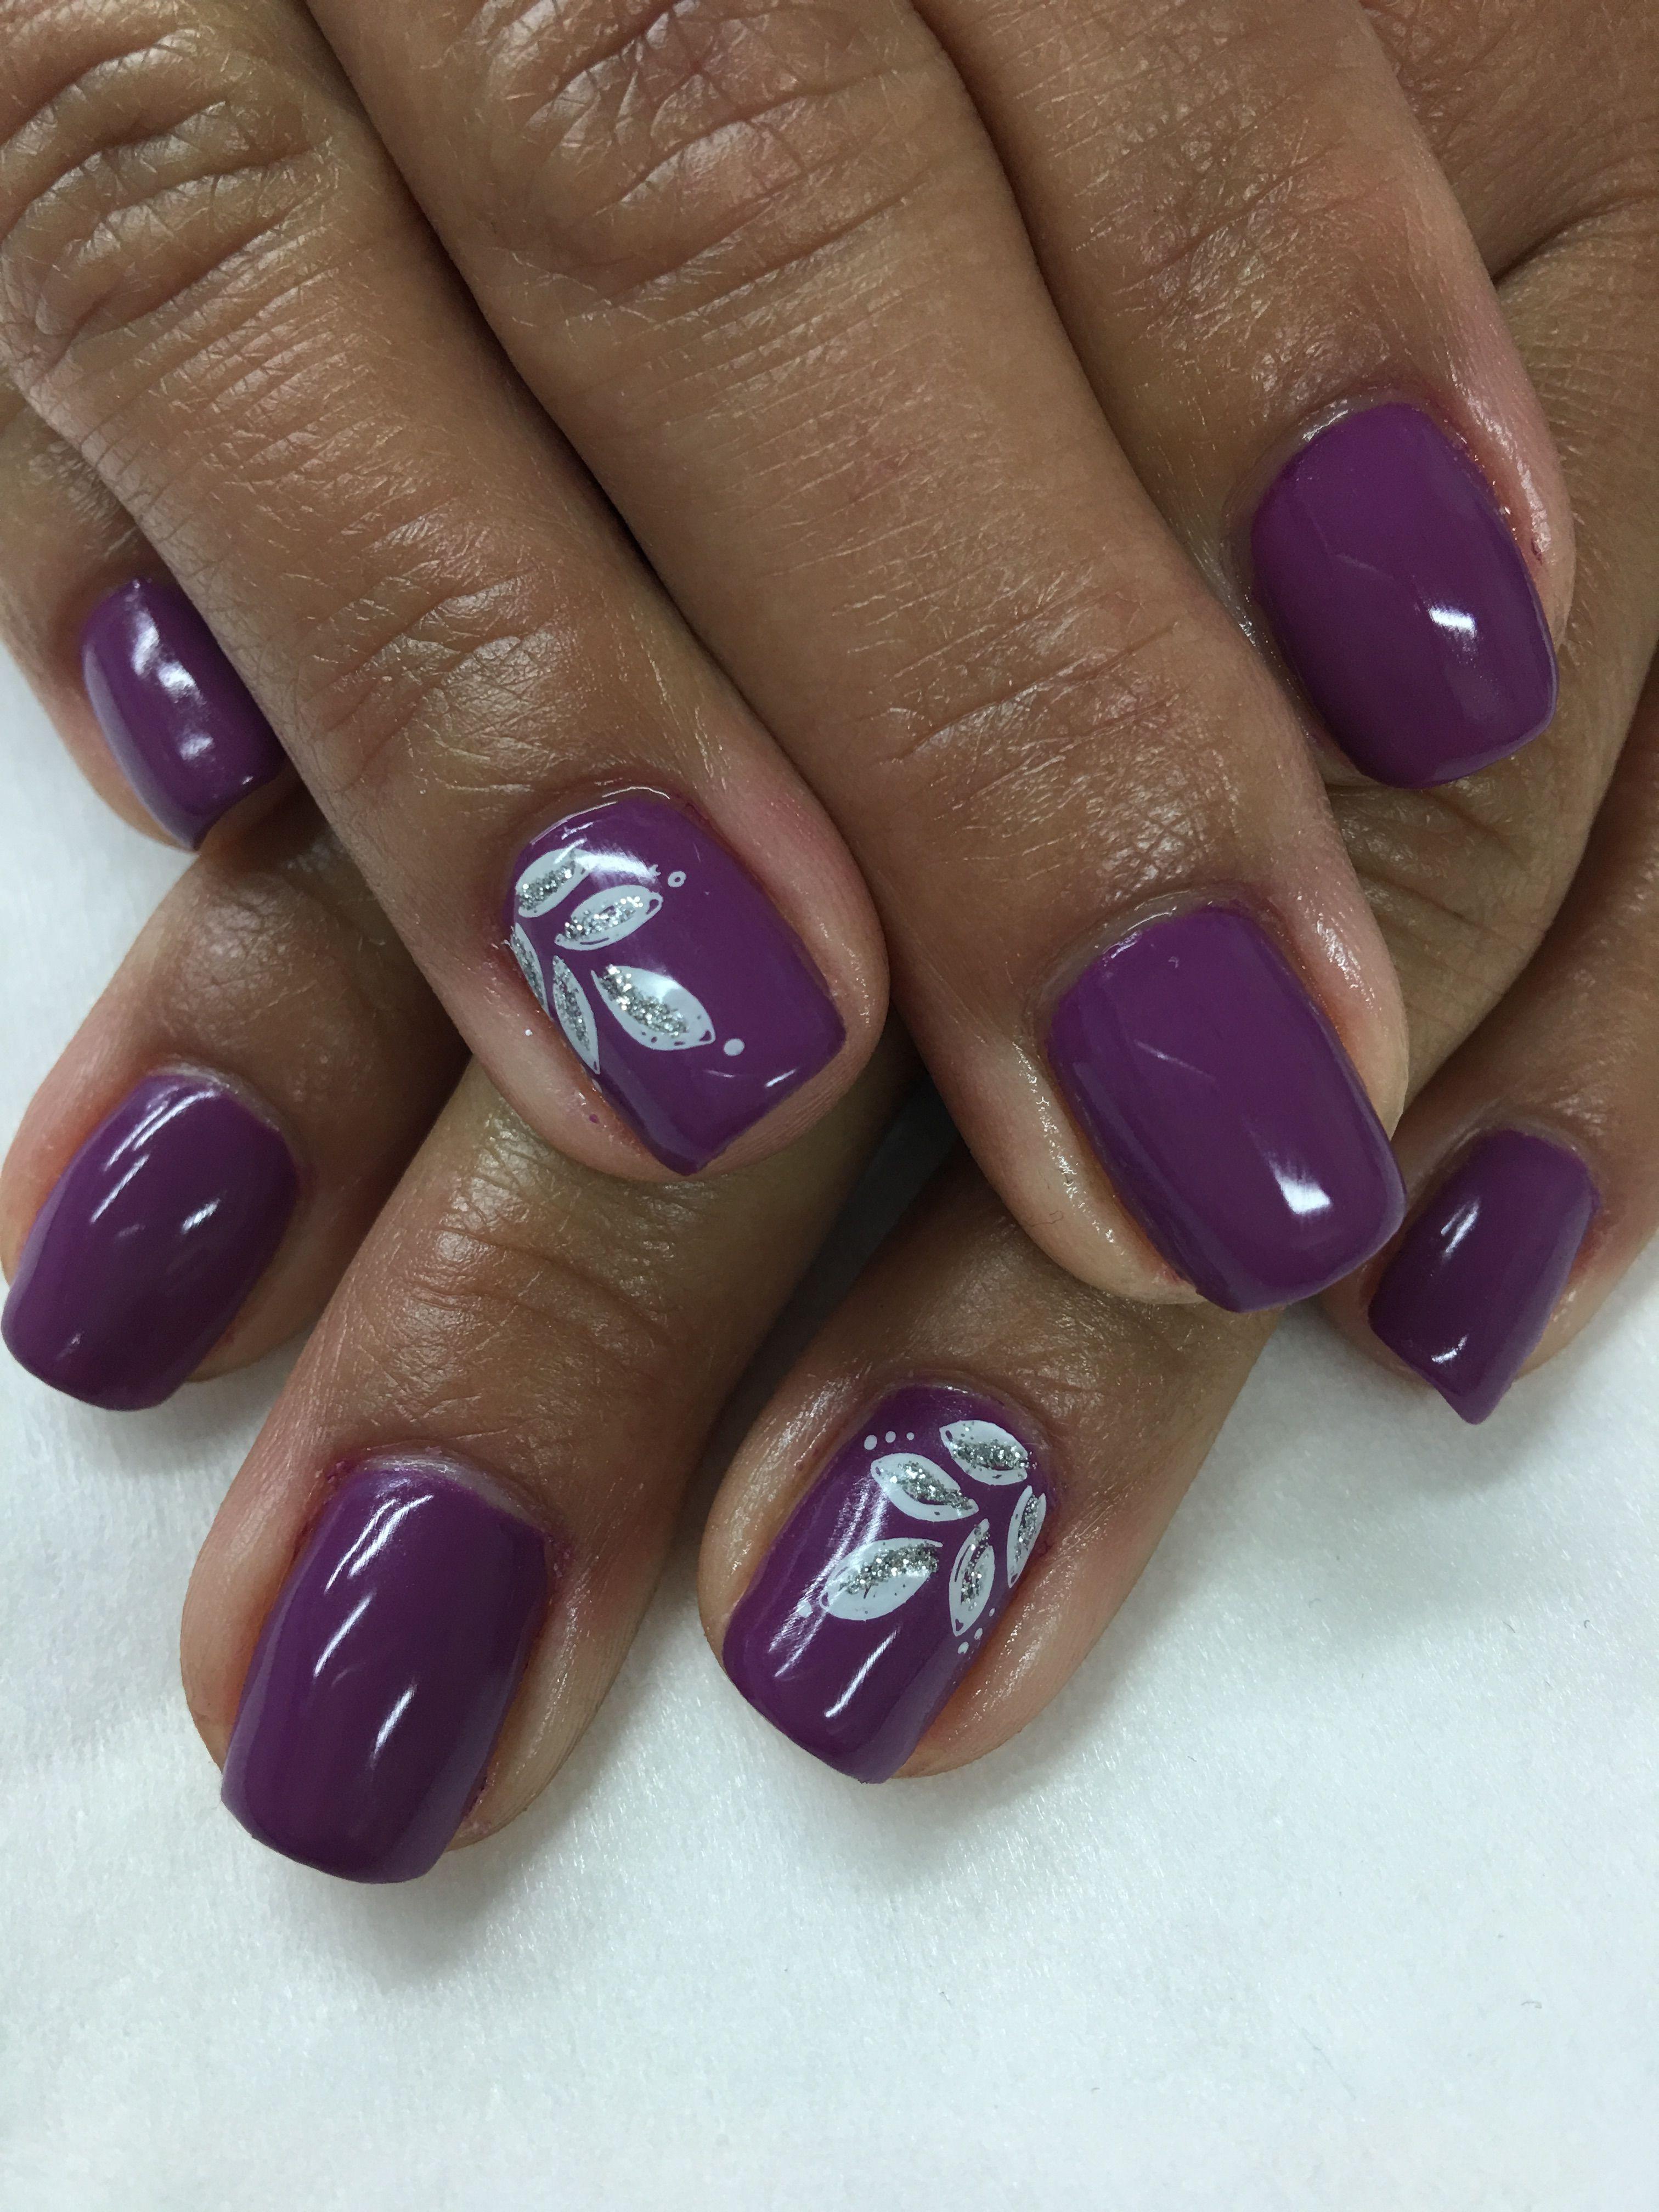 Purple Gel Nails Designs : purple, nails, designs, Purple, Leaves, Nails, Nails,, Designs